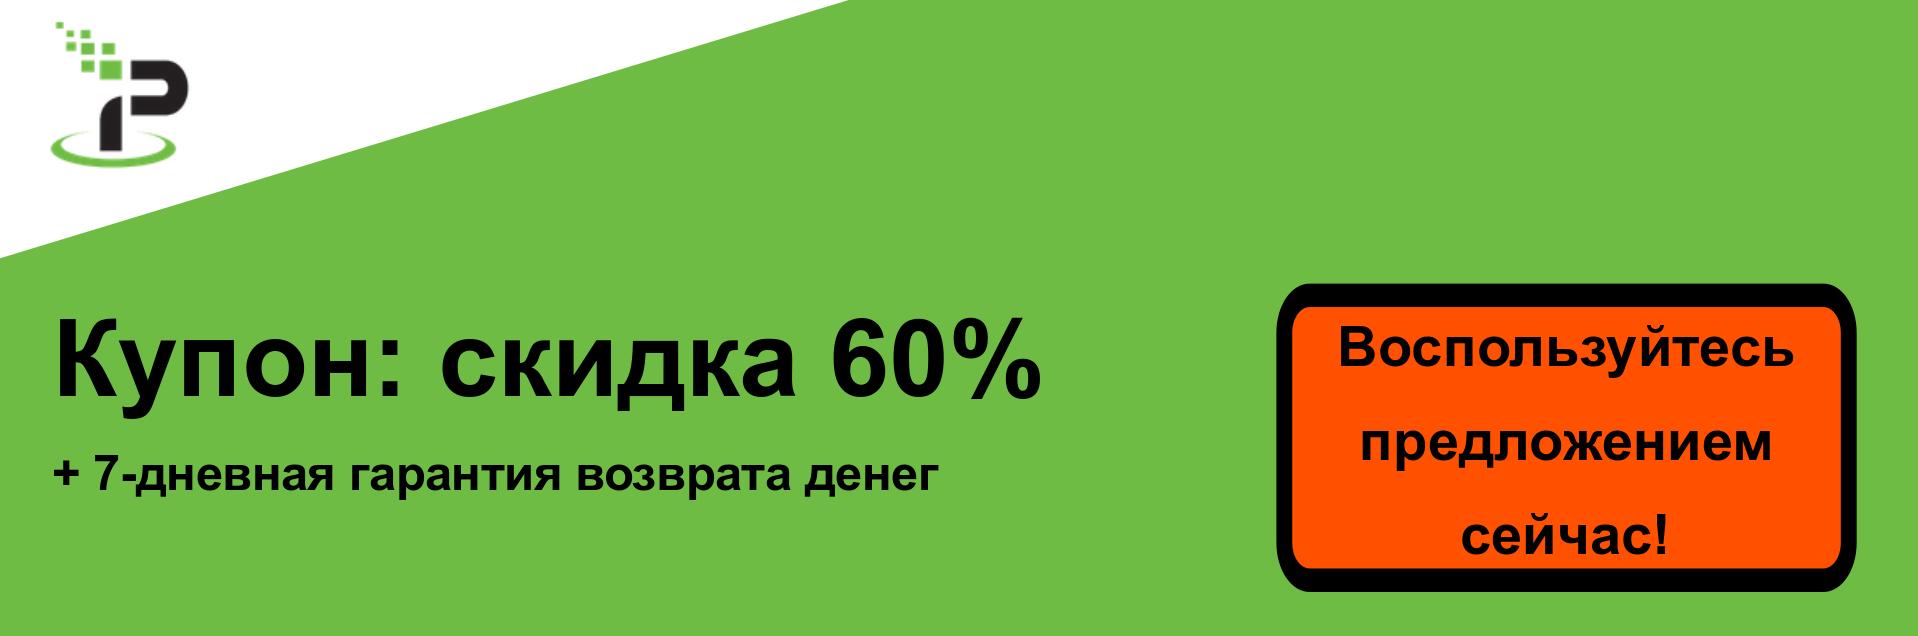 IPVanish купон баннер - скидка 60%